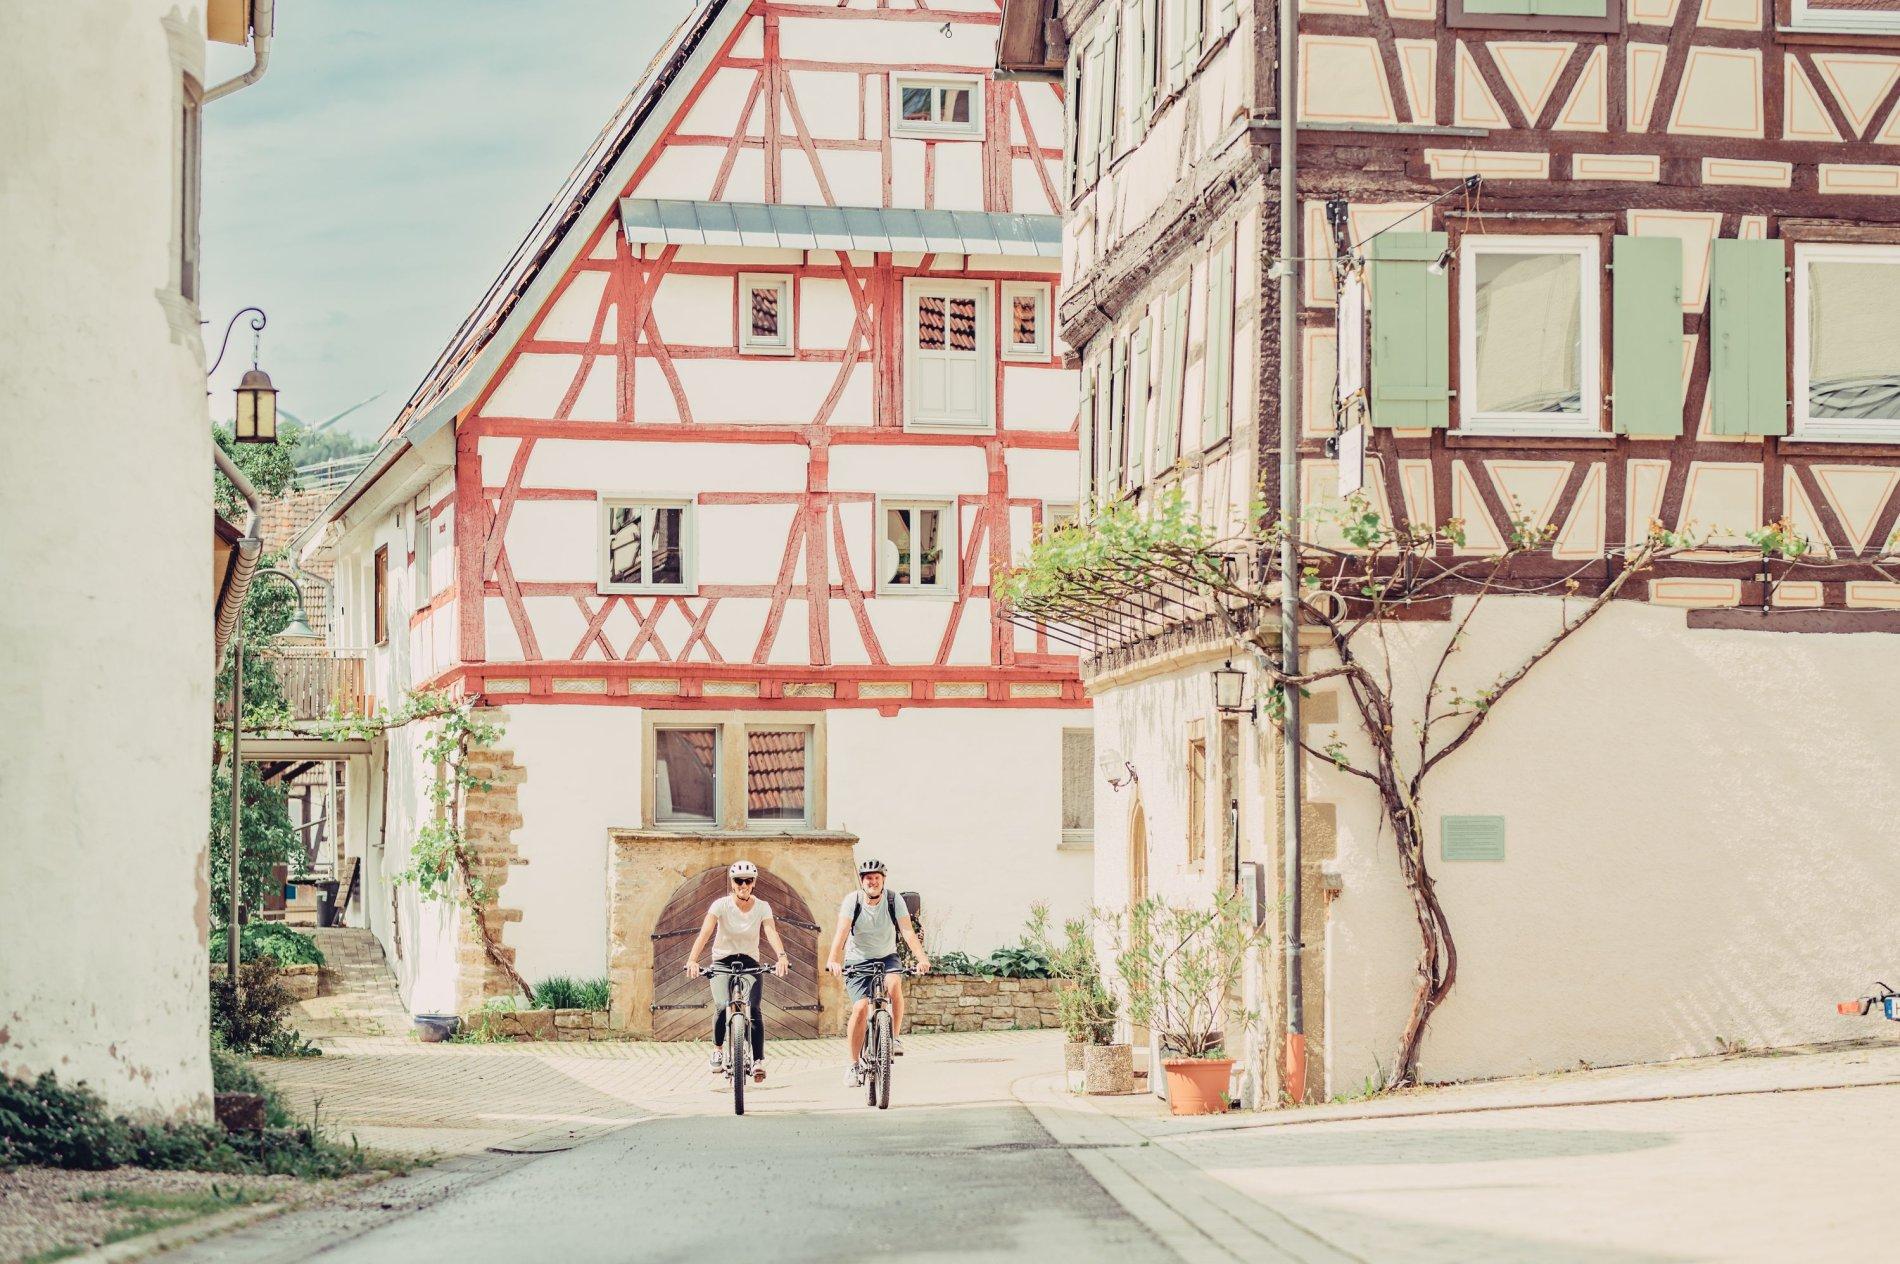 Etappe 1 - Radfahrer auf dem Kocher-Jagst-Radweg | HeilbronnerLand